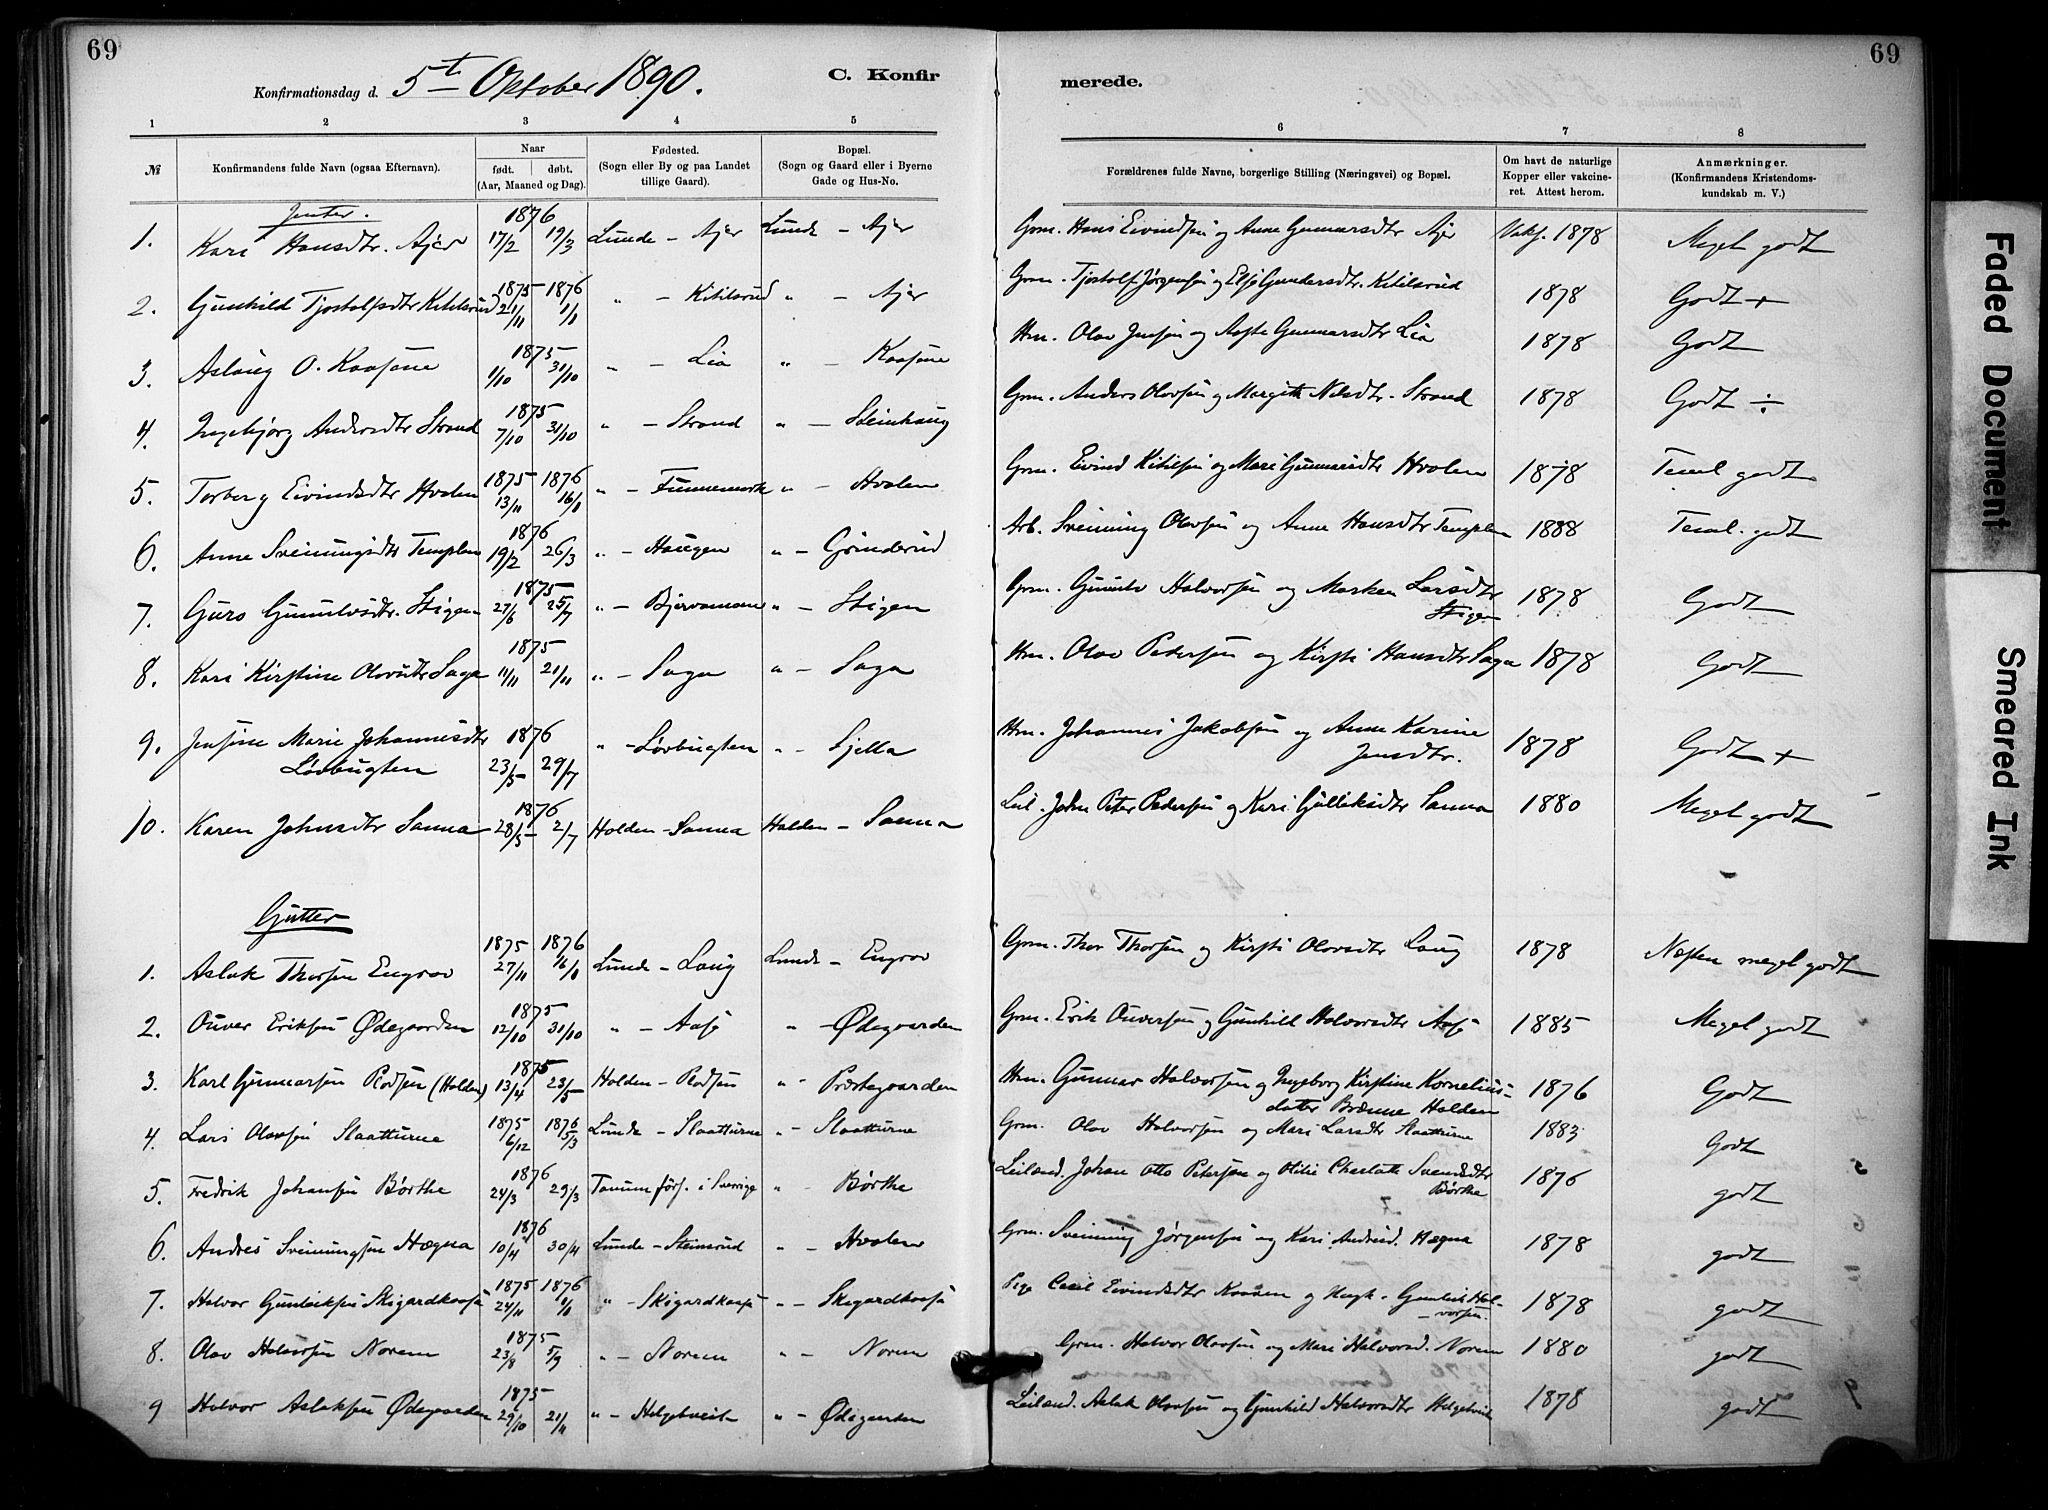 SAKO, Lunde kirkebøker, F/Fa/L0002: Ministerialbok nr. I 2, 1884-1892, s. 69